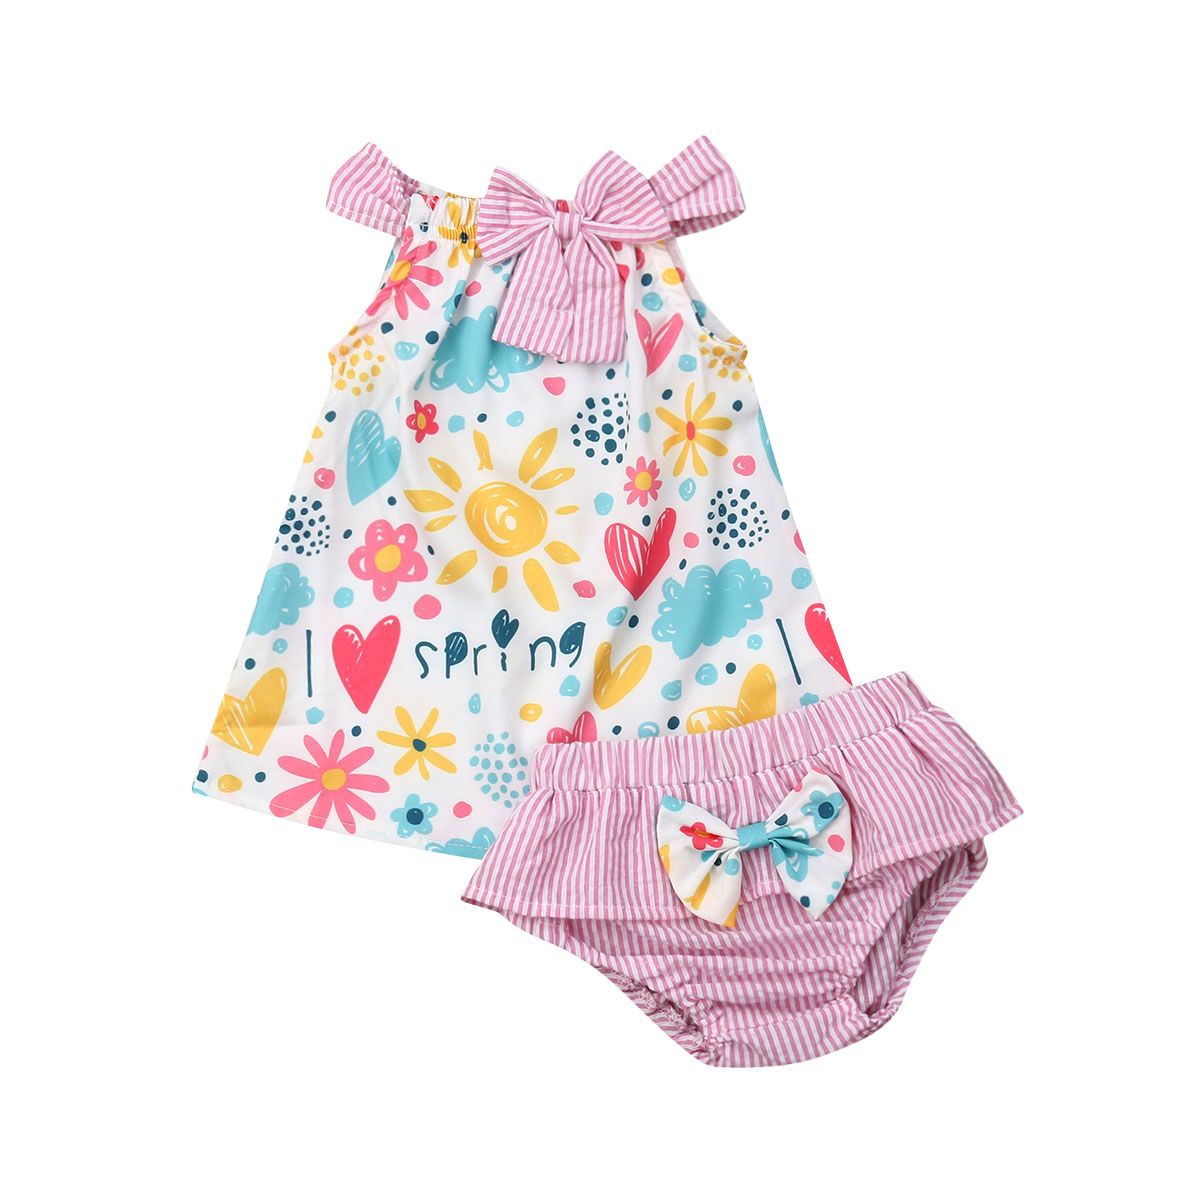 0-24 M Nette Neugeborene Baby Mädchen Ärmellose Blumen Weste Tops Gestreiften Bowknot Baby Pumphose Shorts 2 Pcs Baby Mädchen Kleidung Set Novel (In) Design;